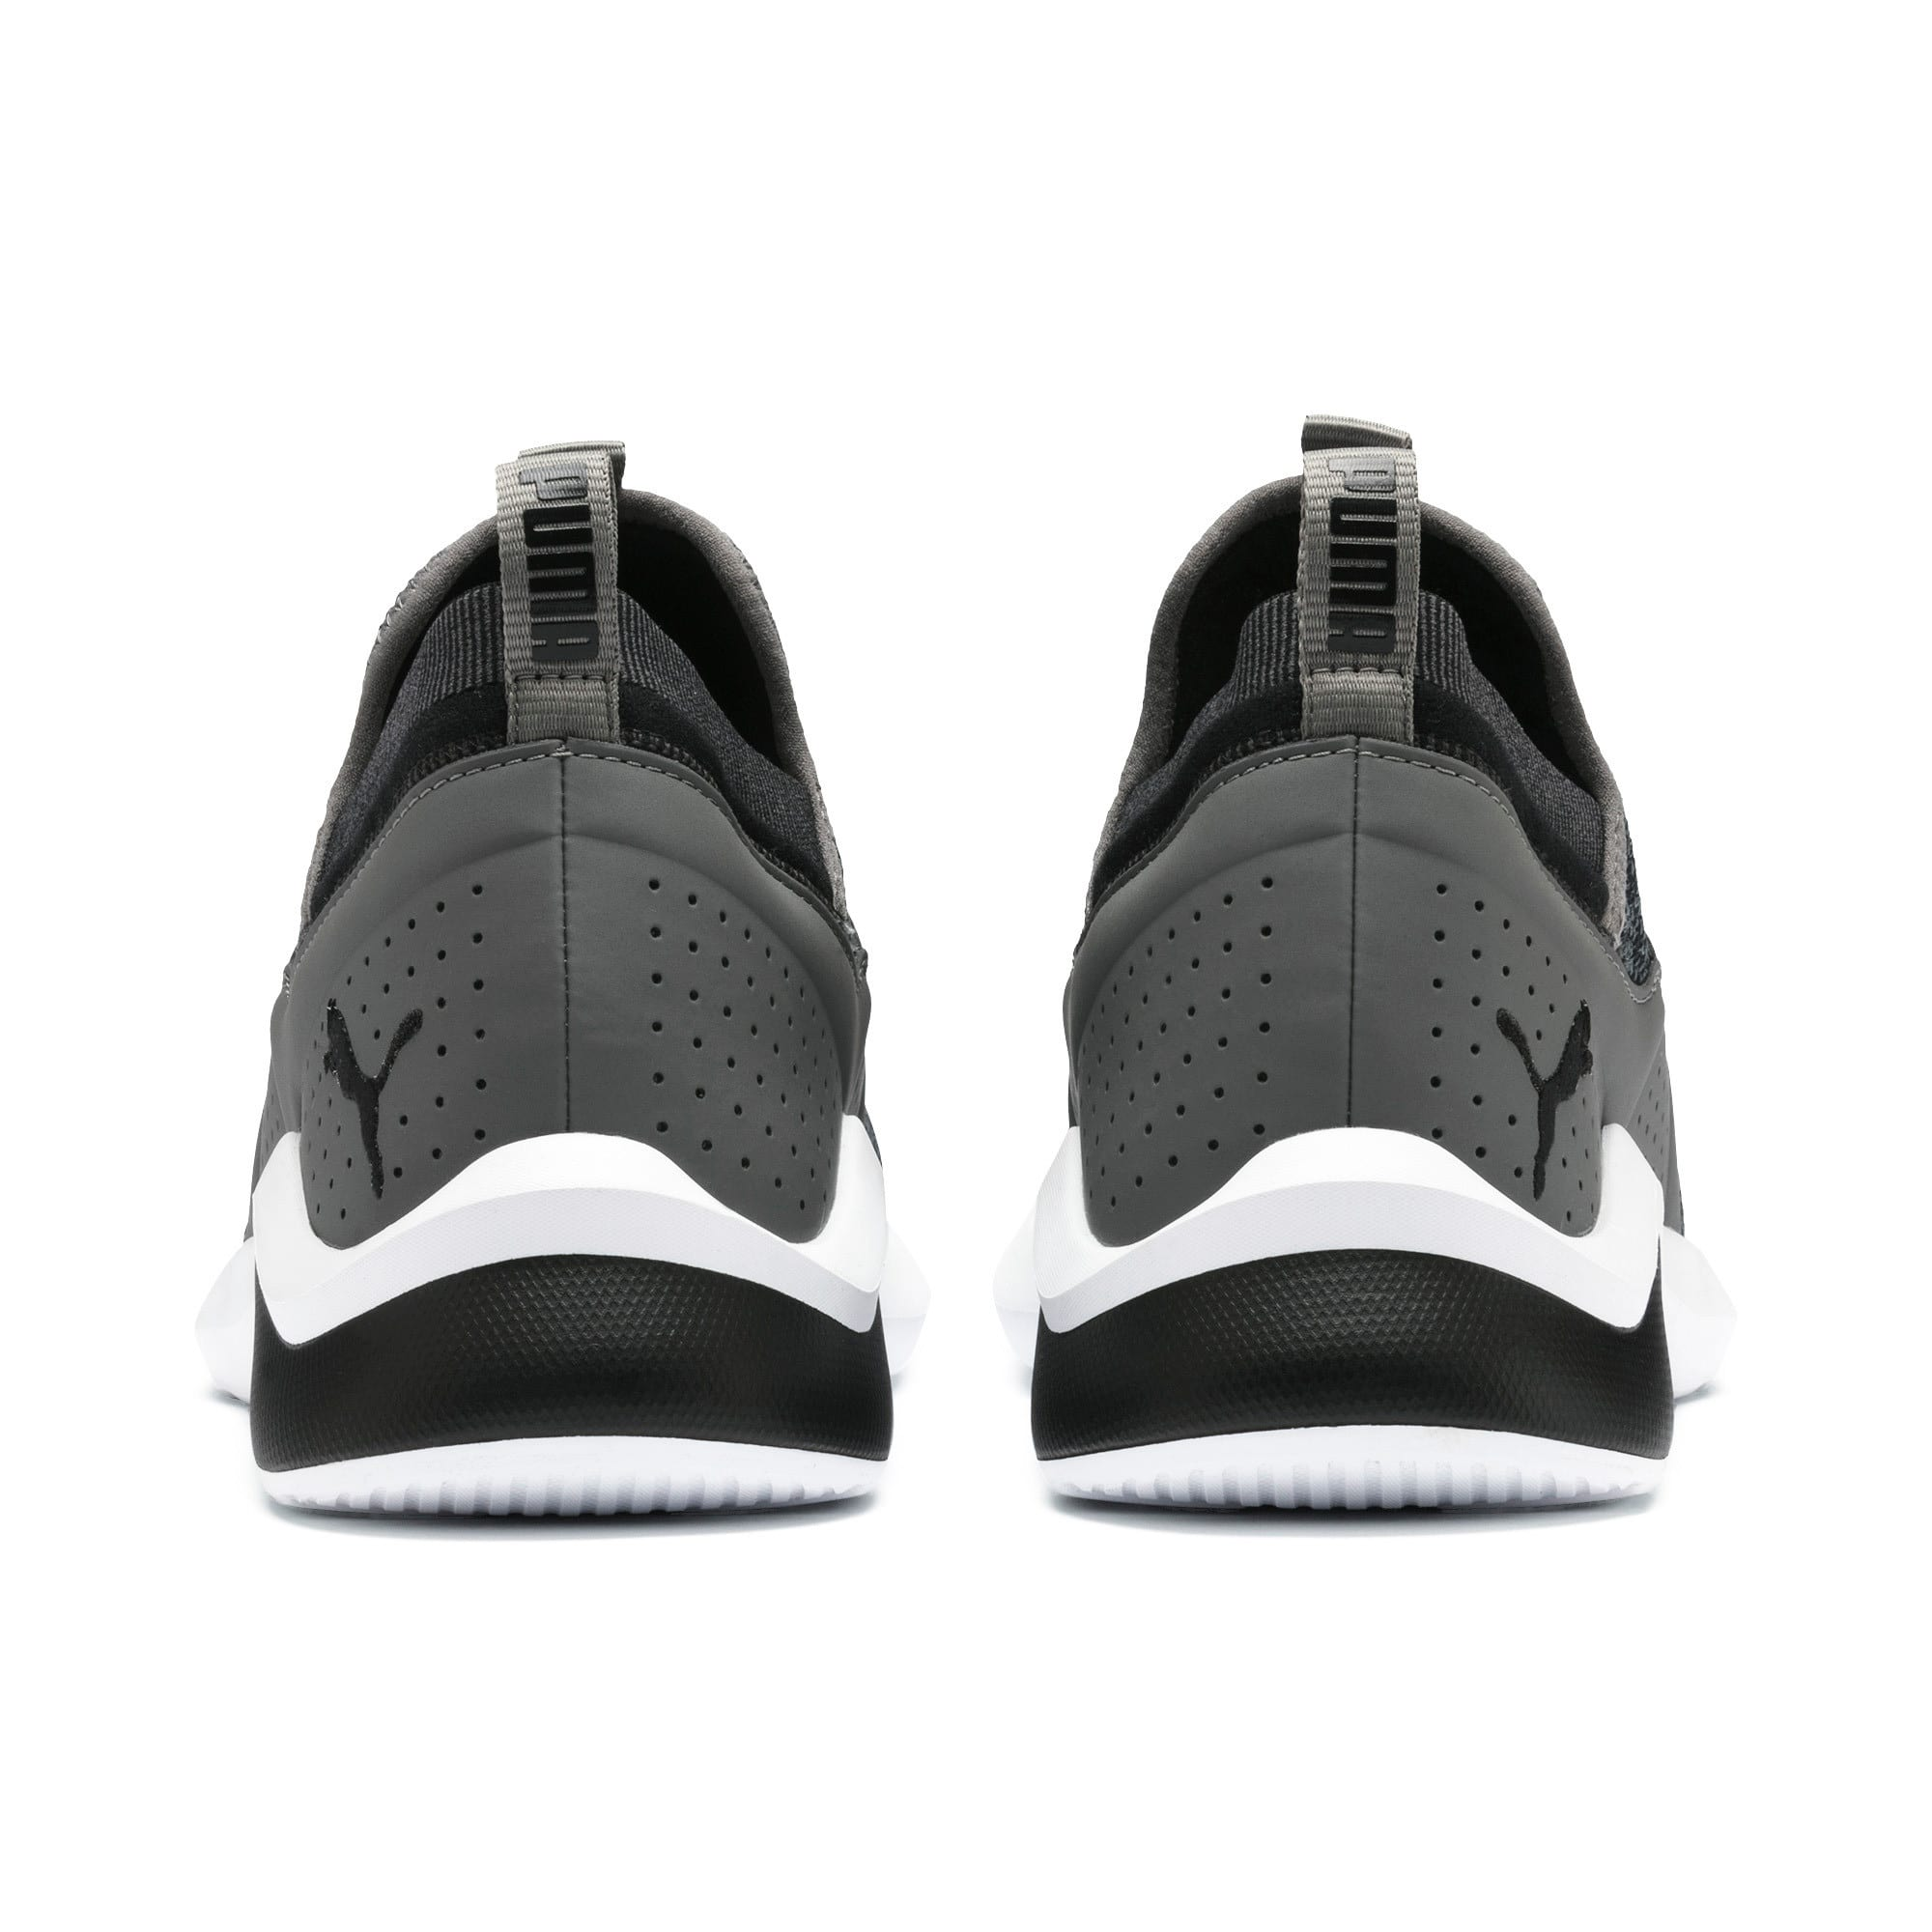 Thumbnail 5 of Emergence Men's Running Shoes, CASTLEROCK-Puma Black, medium-IND